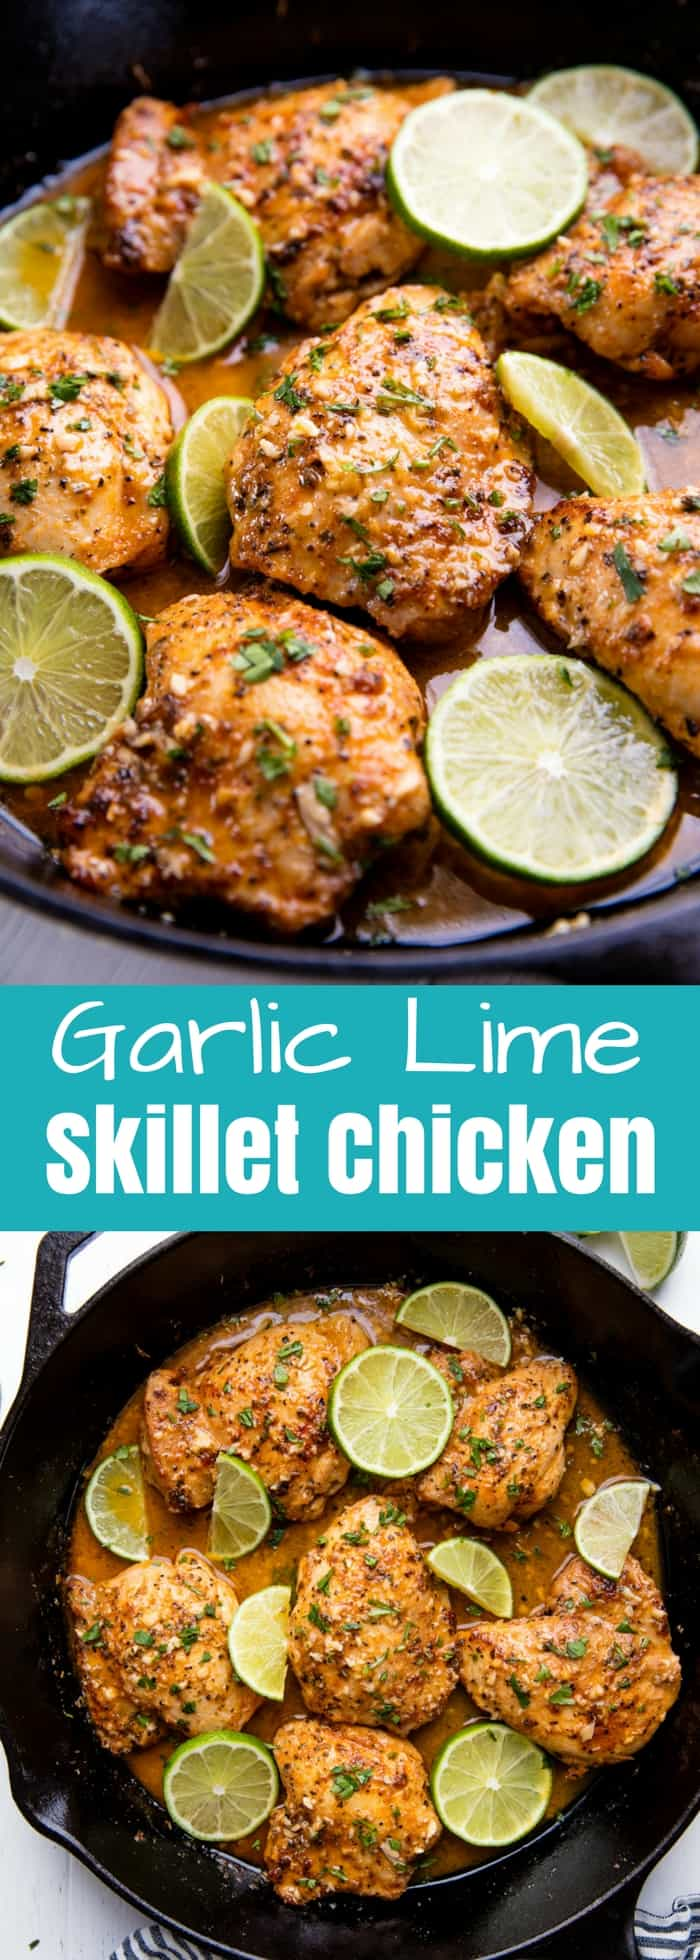 Easy Garlic Lime Skillet Chicken images